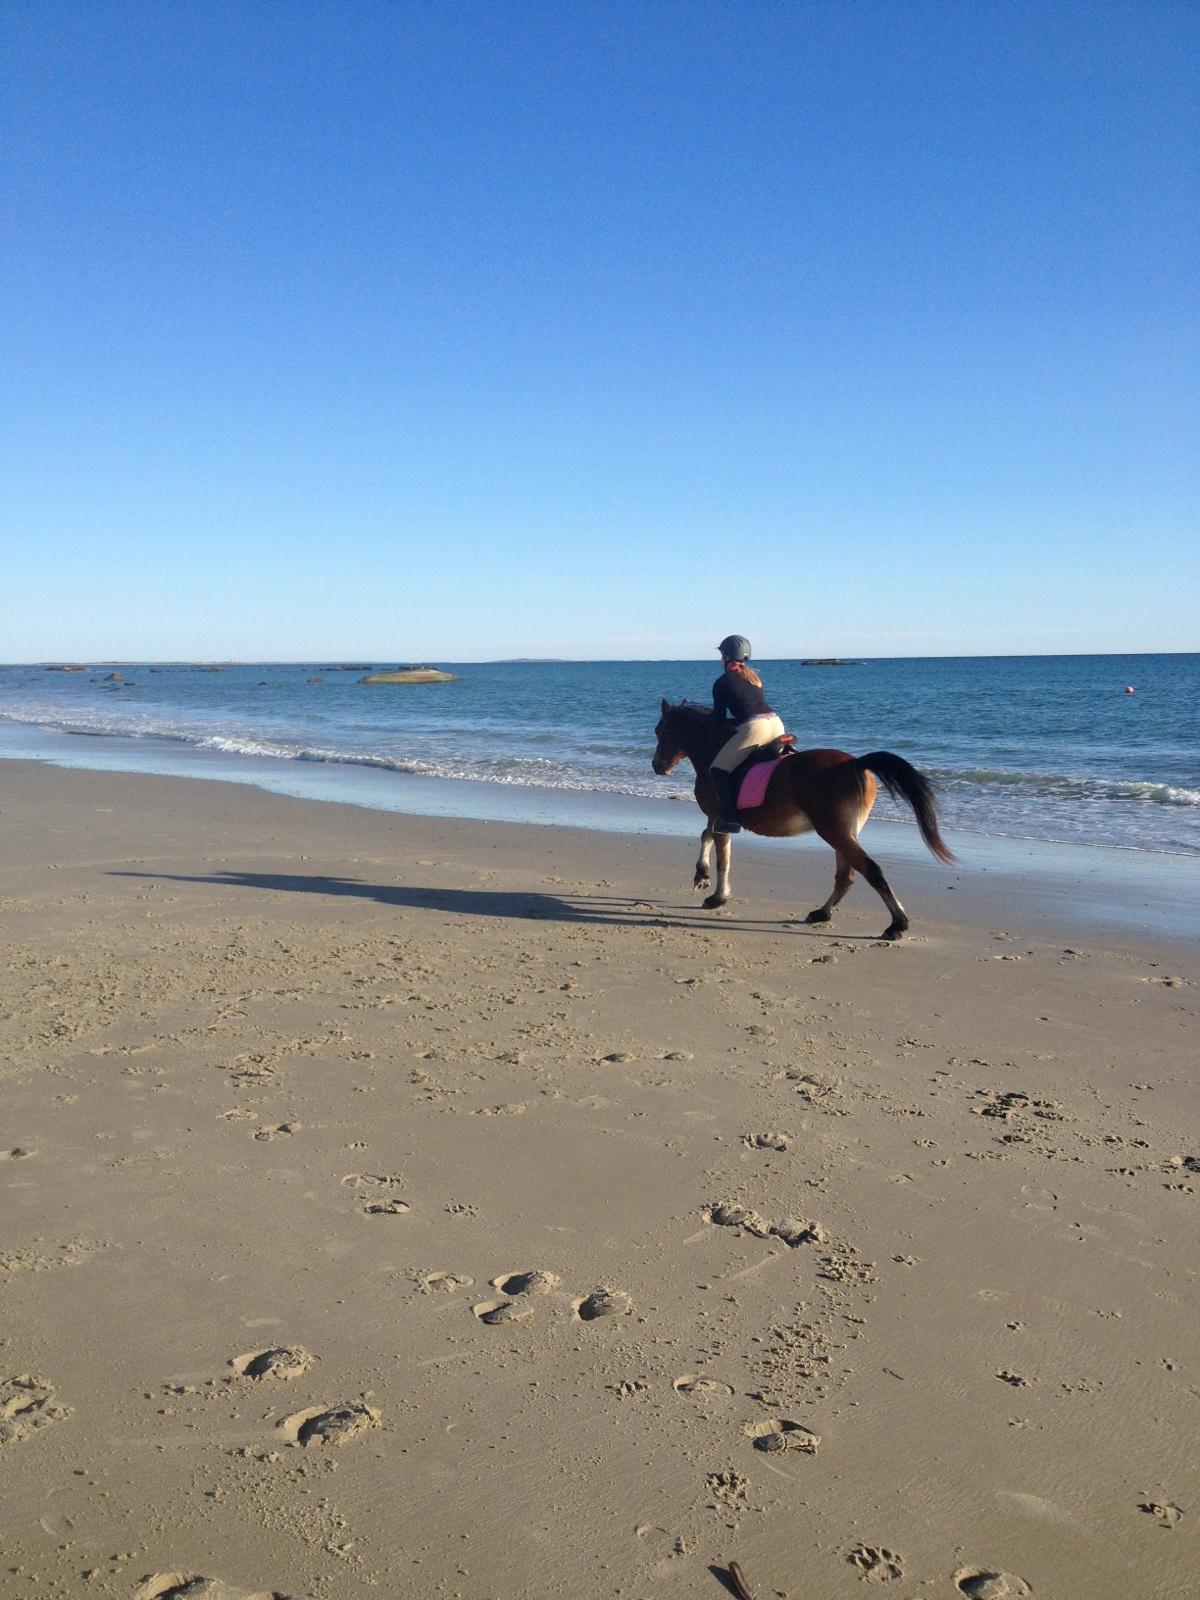 beach ride oct 2013 (4).jpg